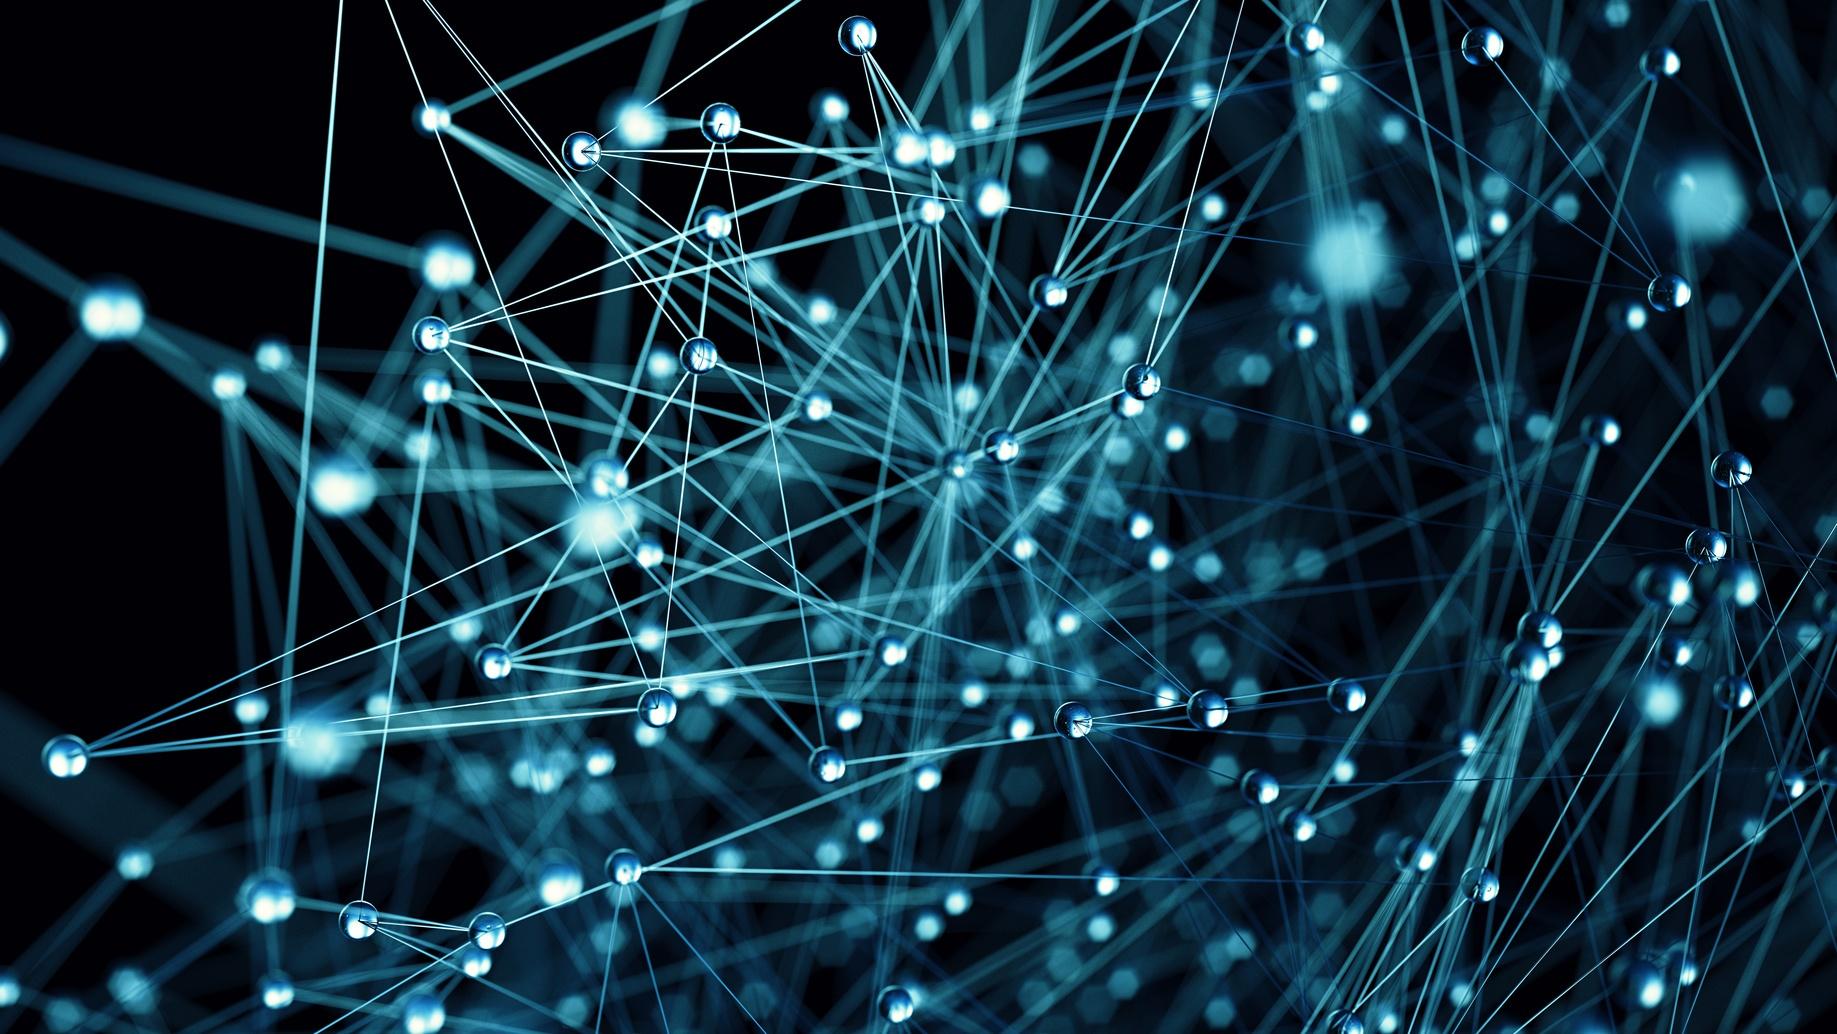 Molecular structure illustration close up blue background